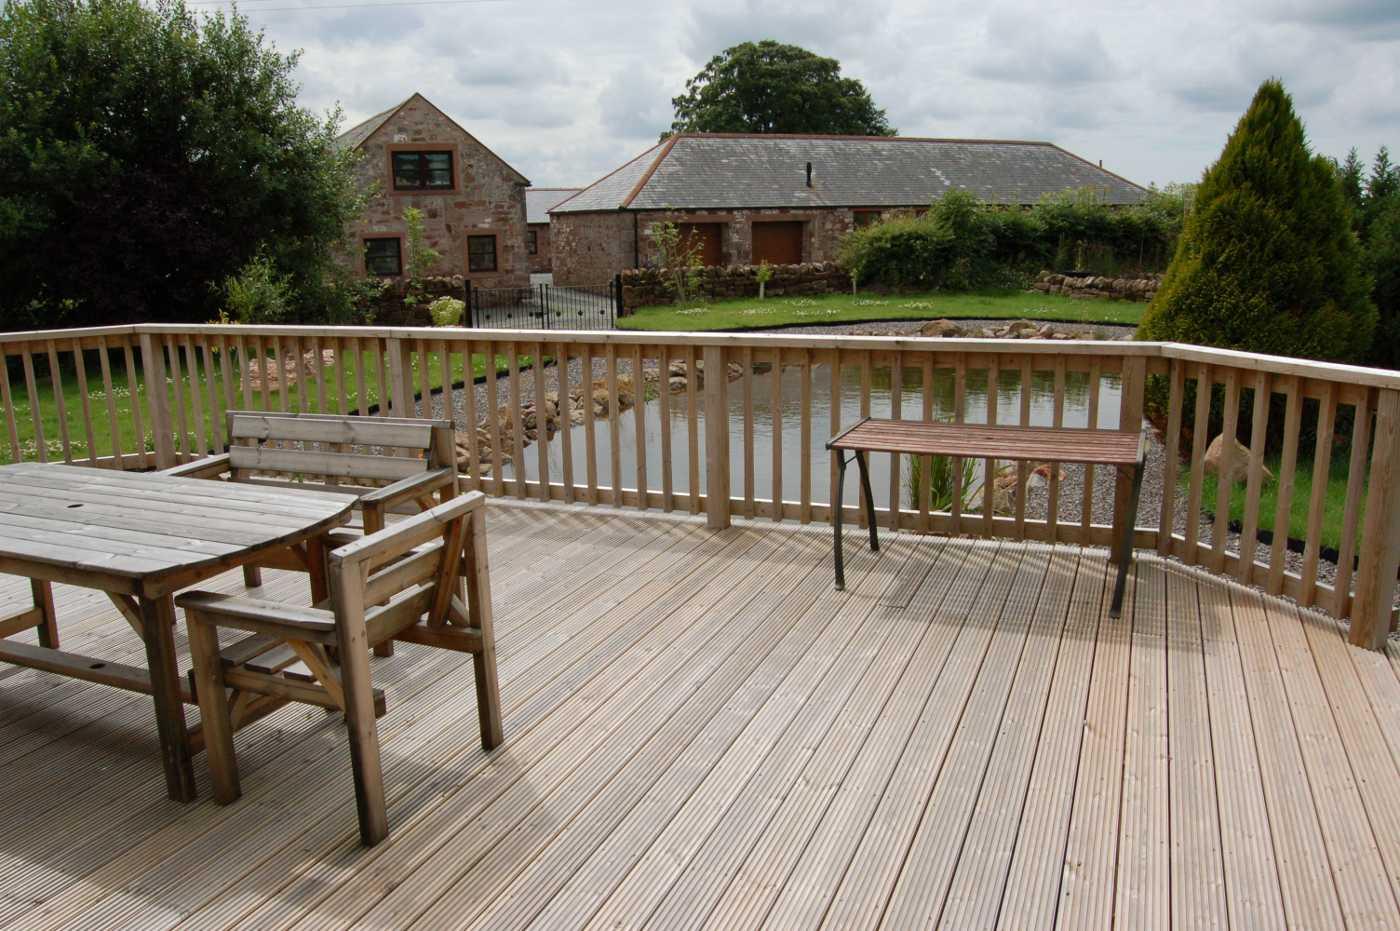 Wooden deck over Pond Dumfriesshire